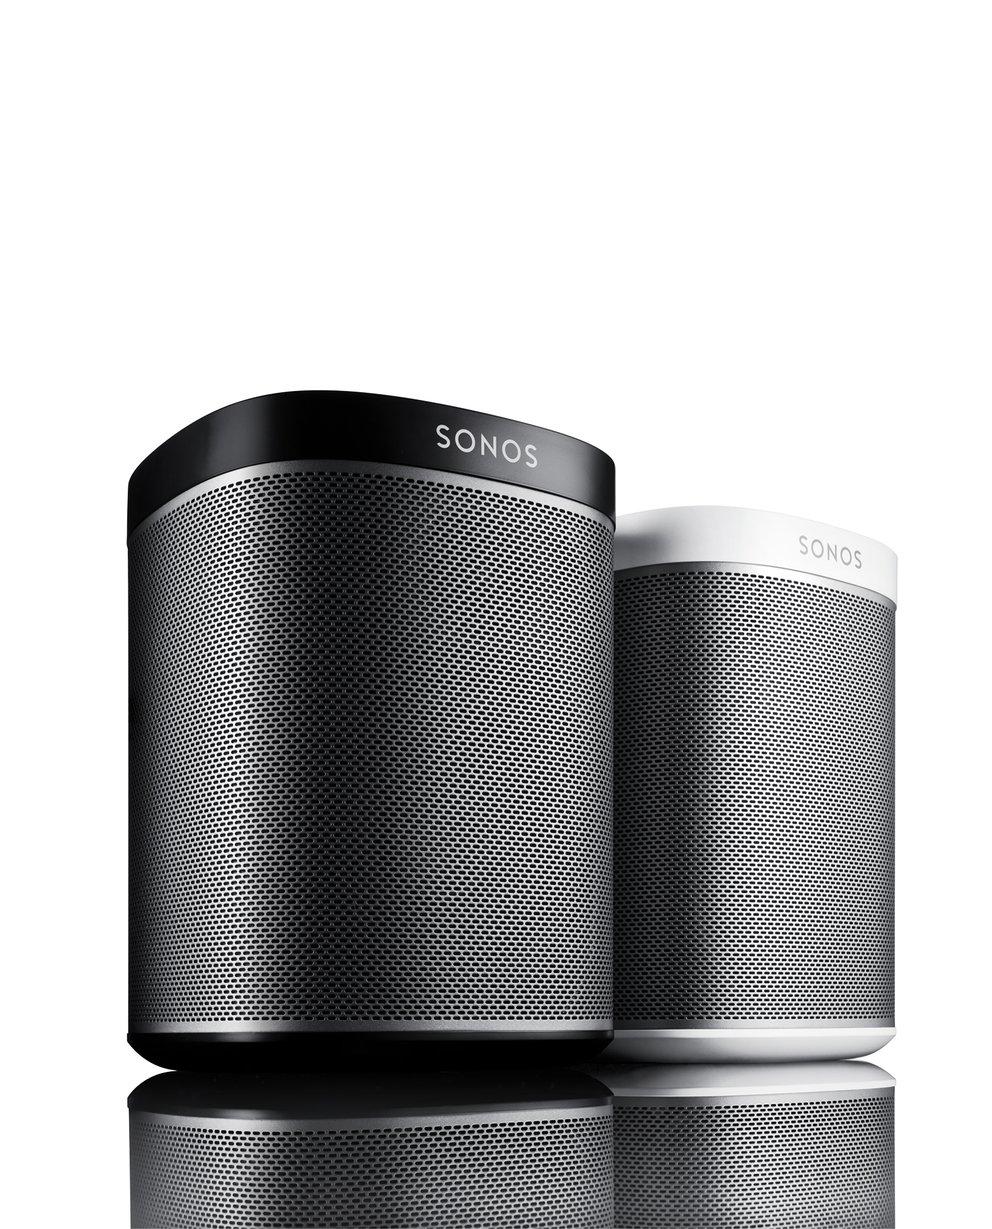 Sonos,Play1,Lautsprecher,Multiroom